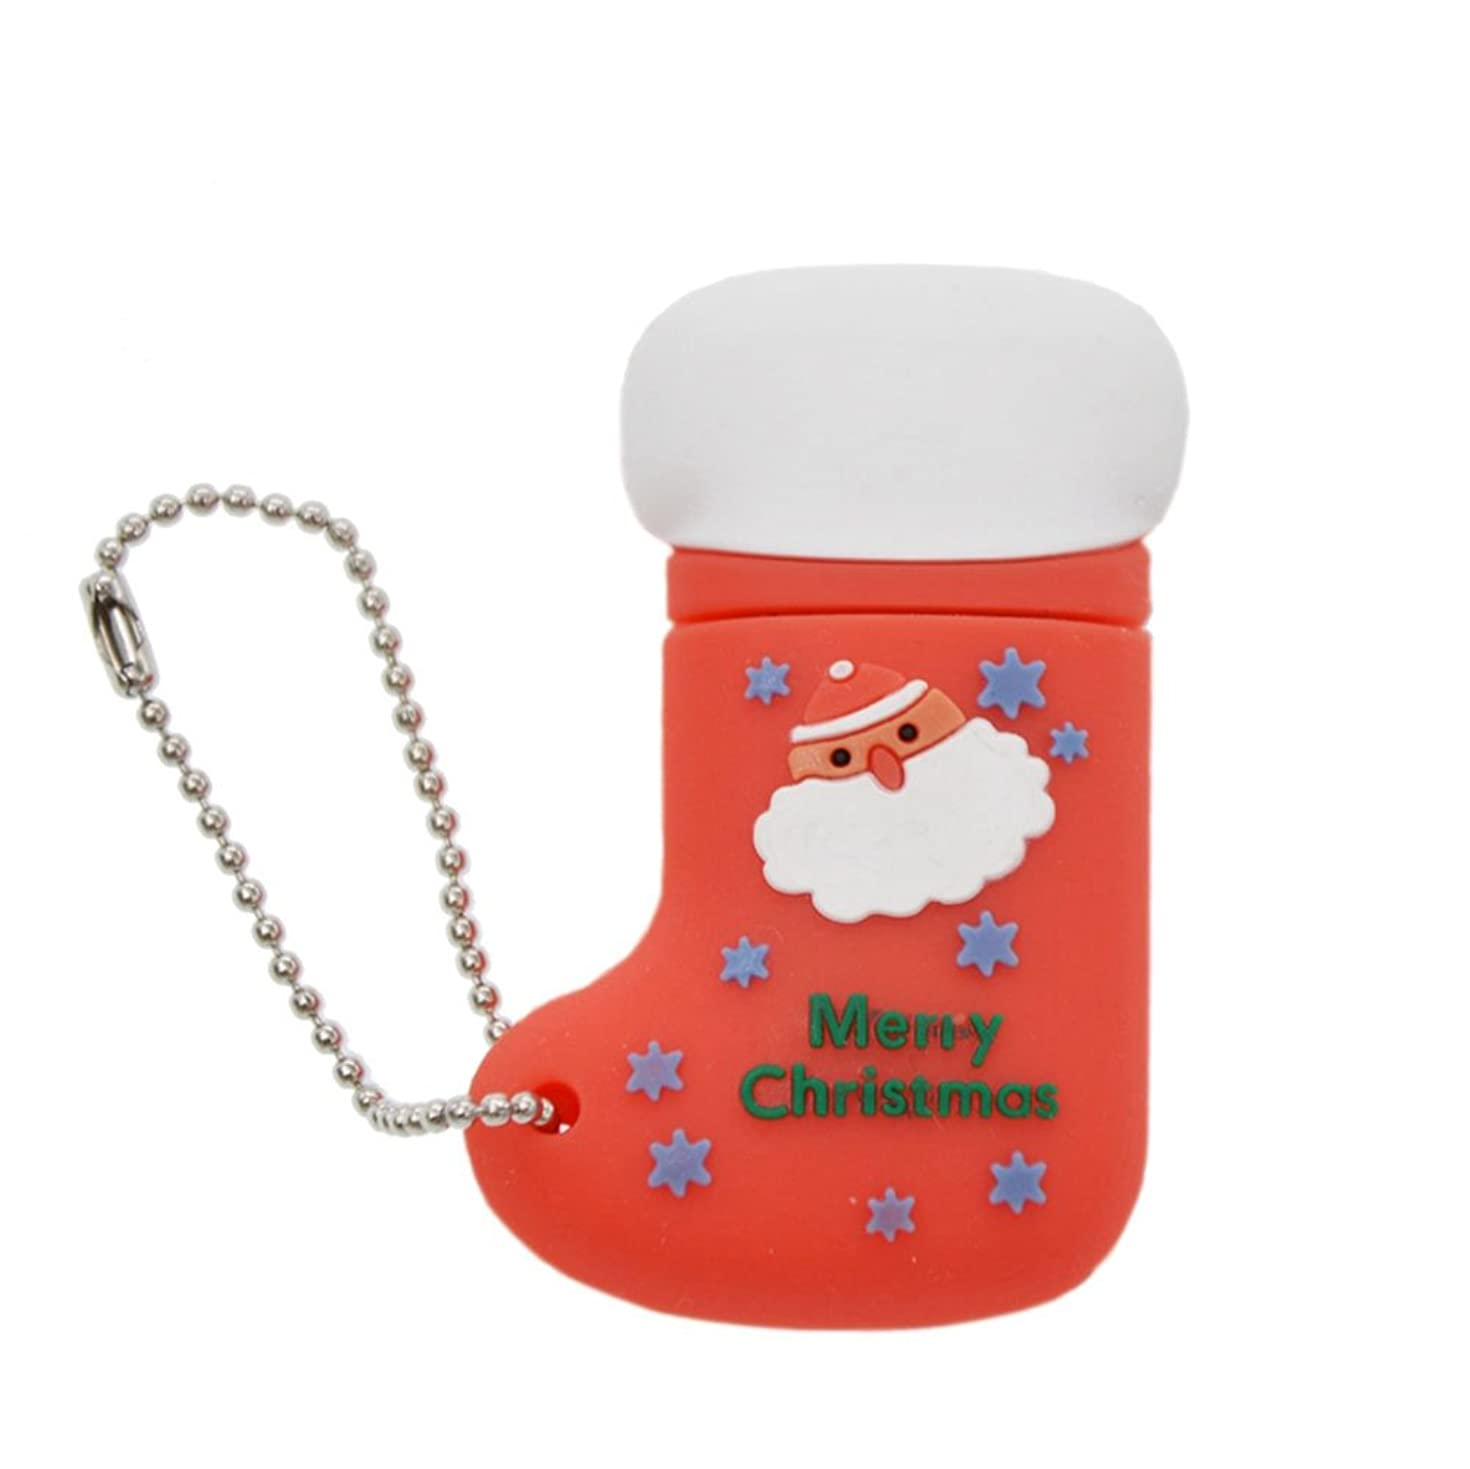 USB Flash Drive 16GB Thumb Drive - Cartoon Christmas Sock USB 2.0 Pen Drive - FEBNISCTE Memory Stick Jump Drive for Girl/Woman/Wife